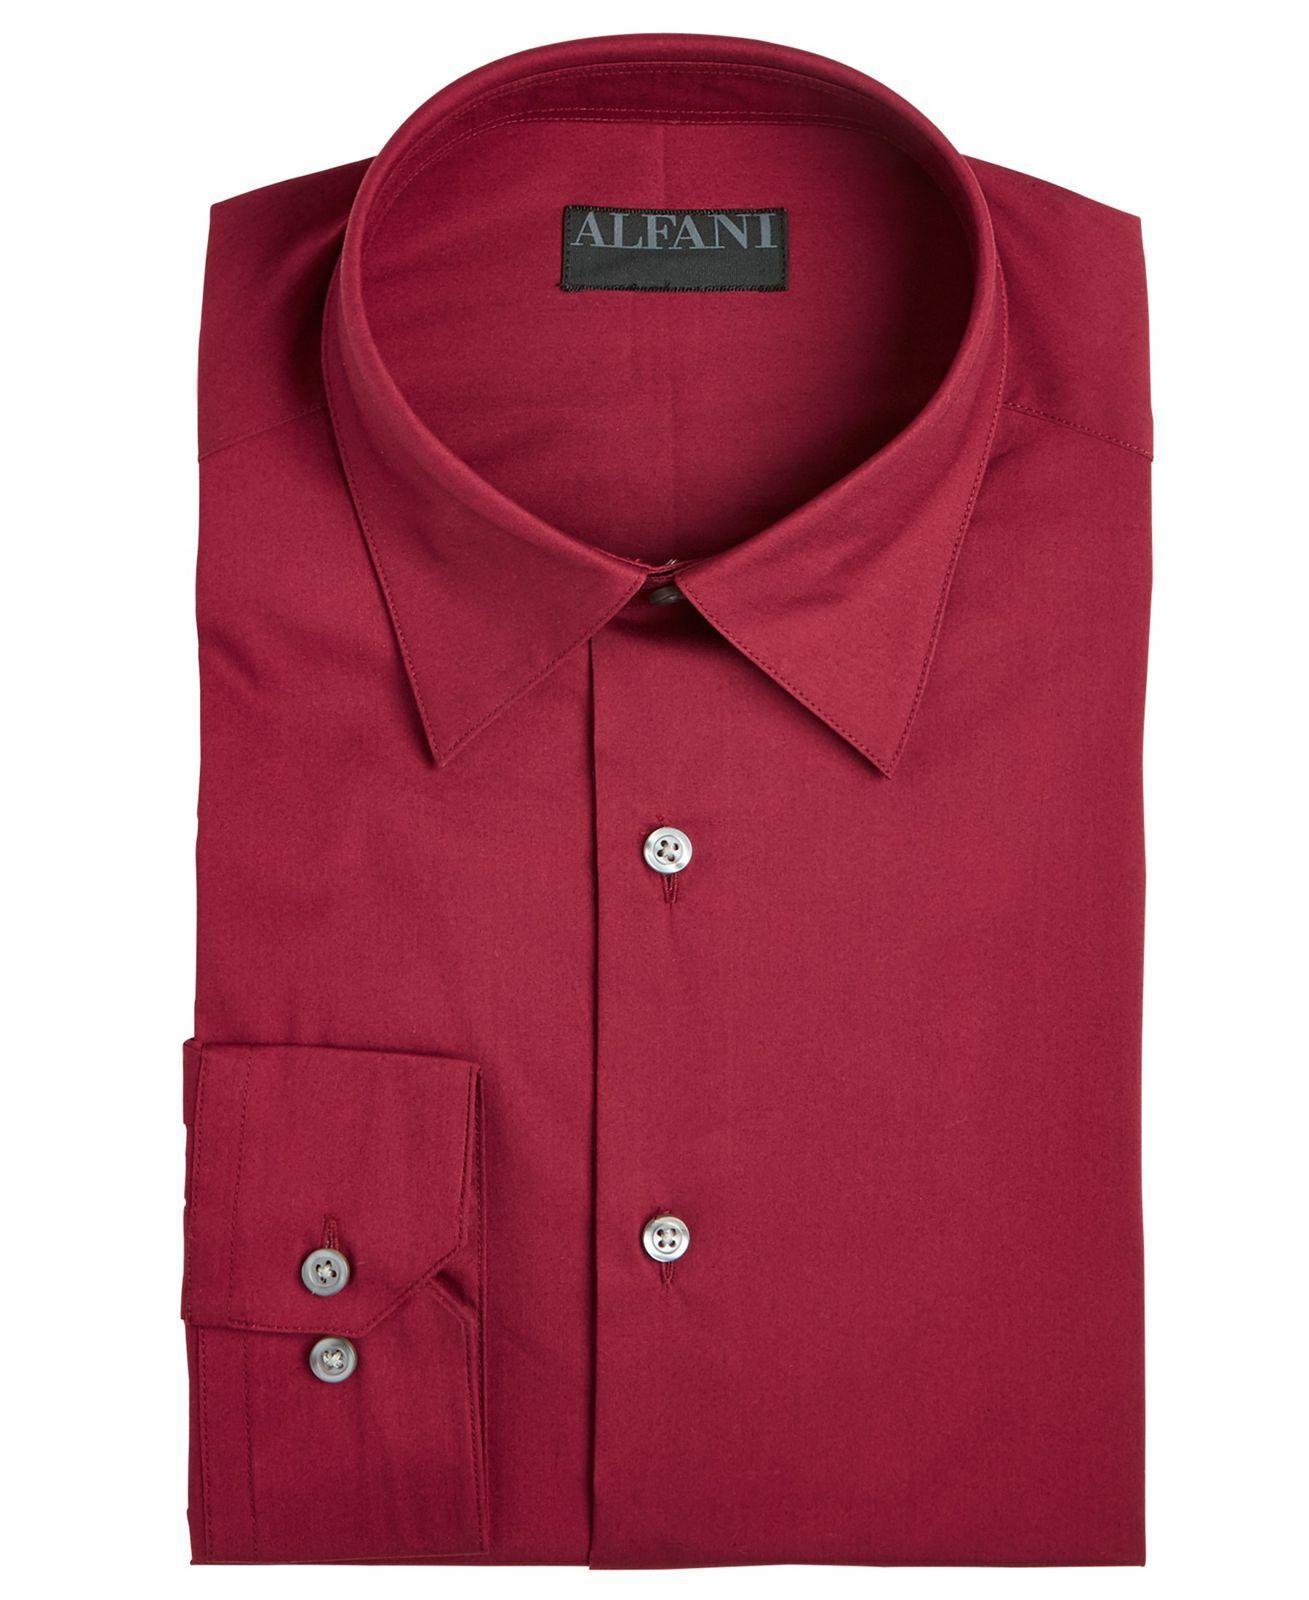 New Men/'s Alfani Short Sleeved Textured Dress Shirt Medium Black